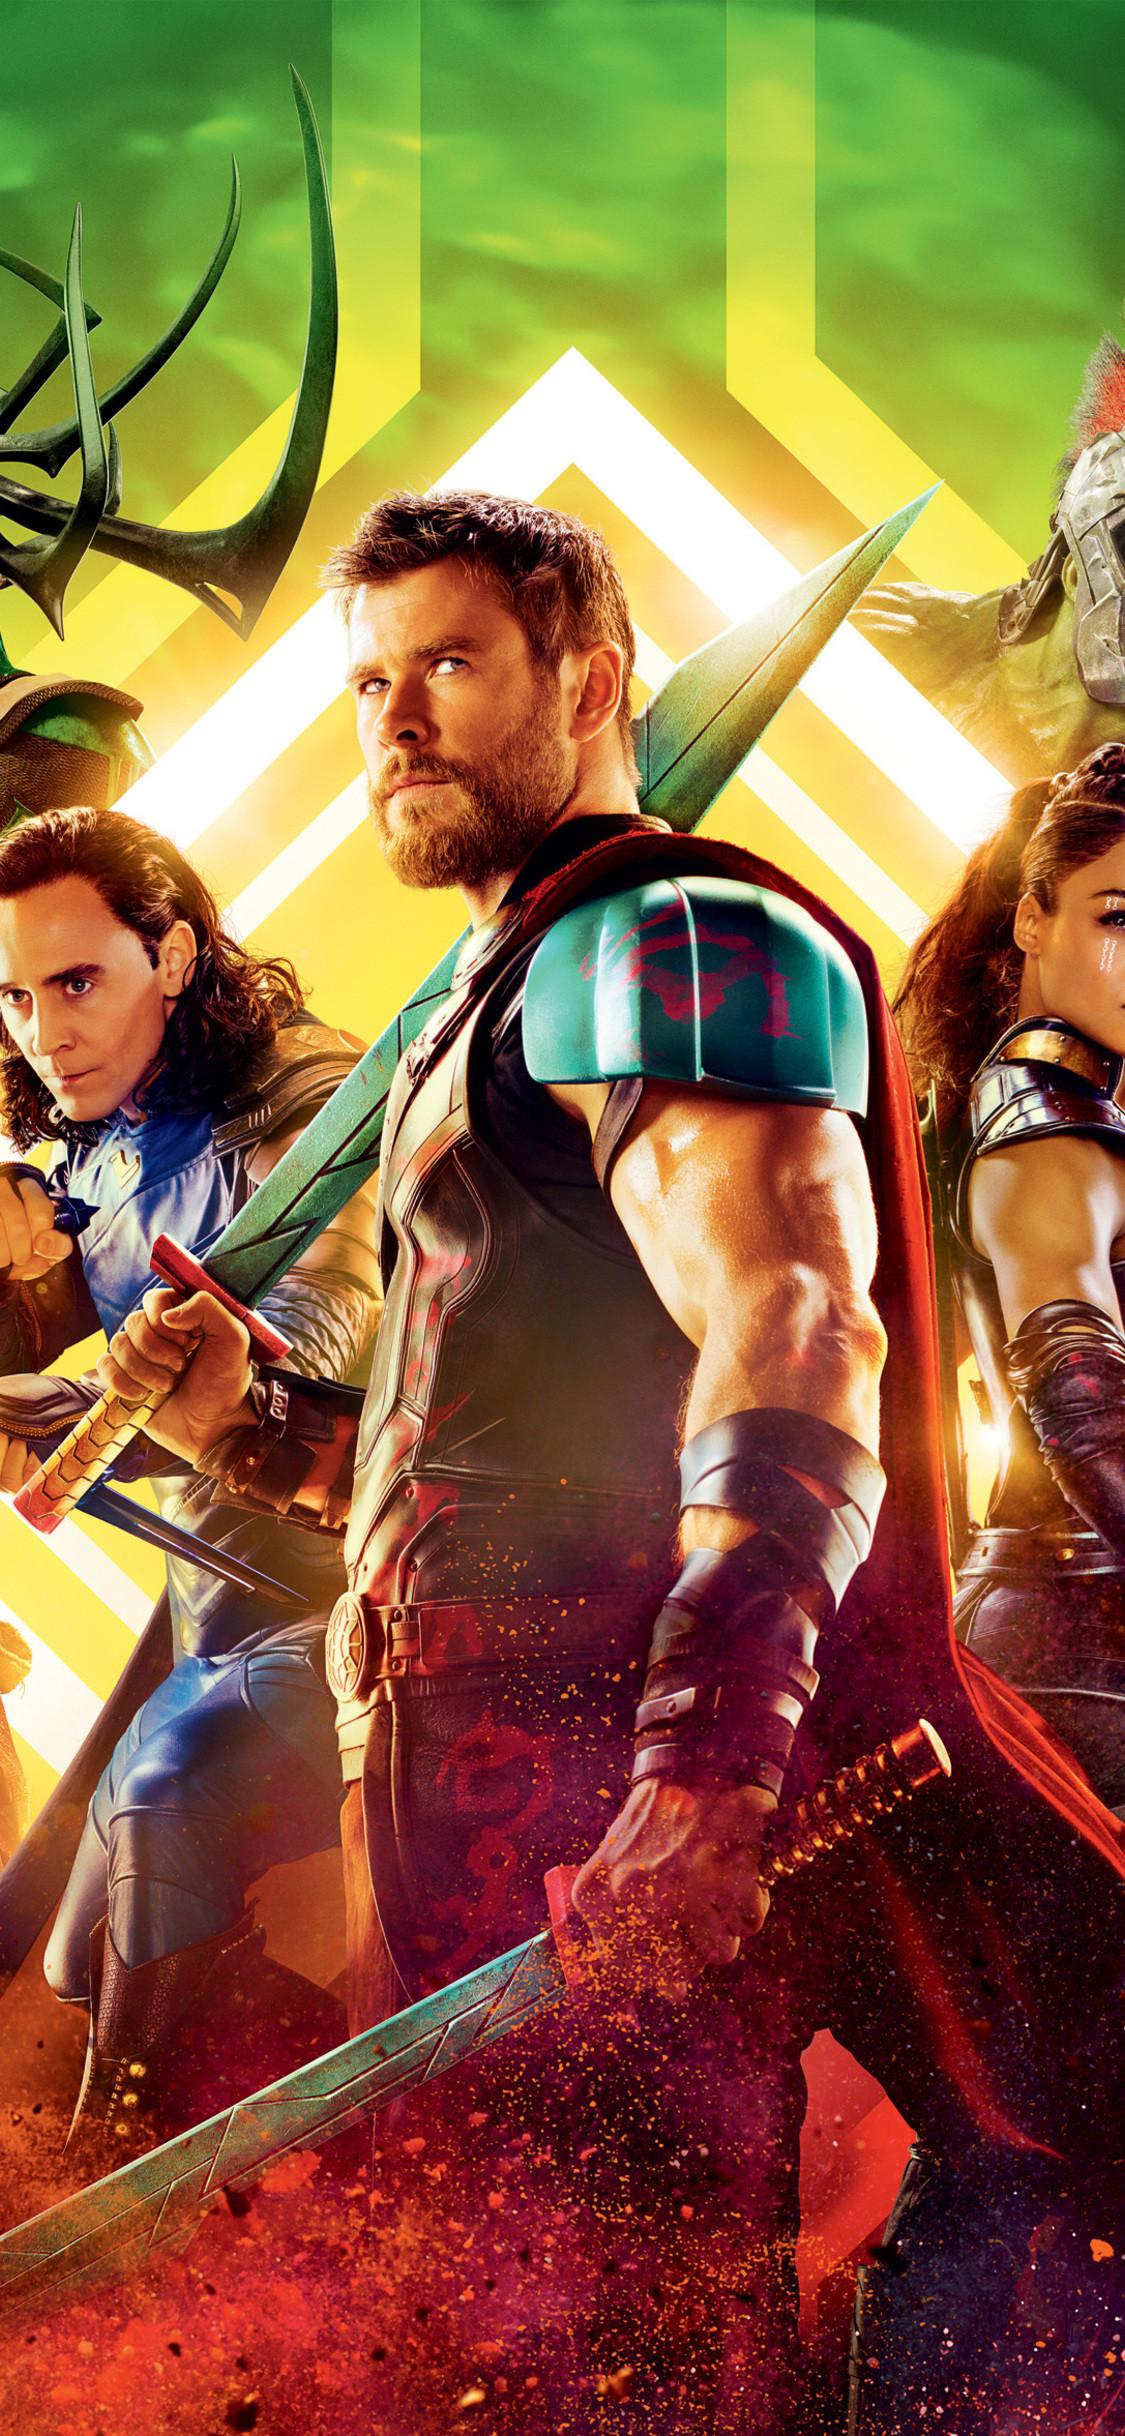 4k Thor Ragnarok Cl Data Src Thor Iphone Wallpaper Thor Ragnarok Poster 1125x2436 Wallpaper Teahub Io